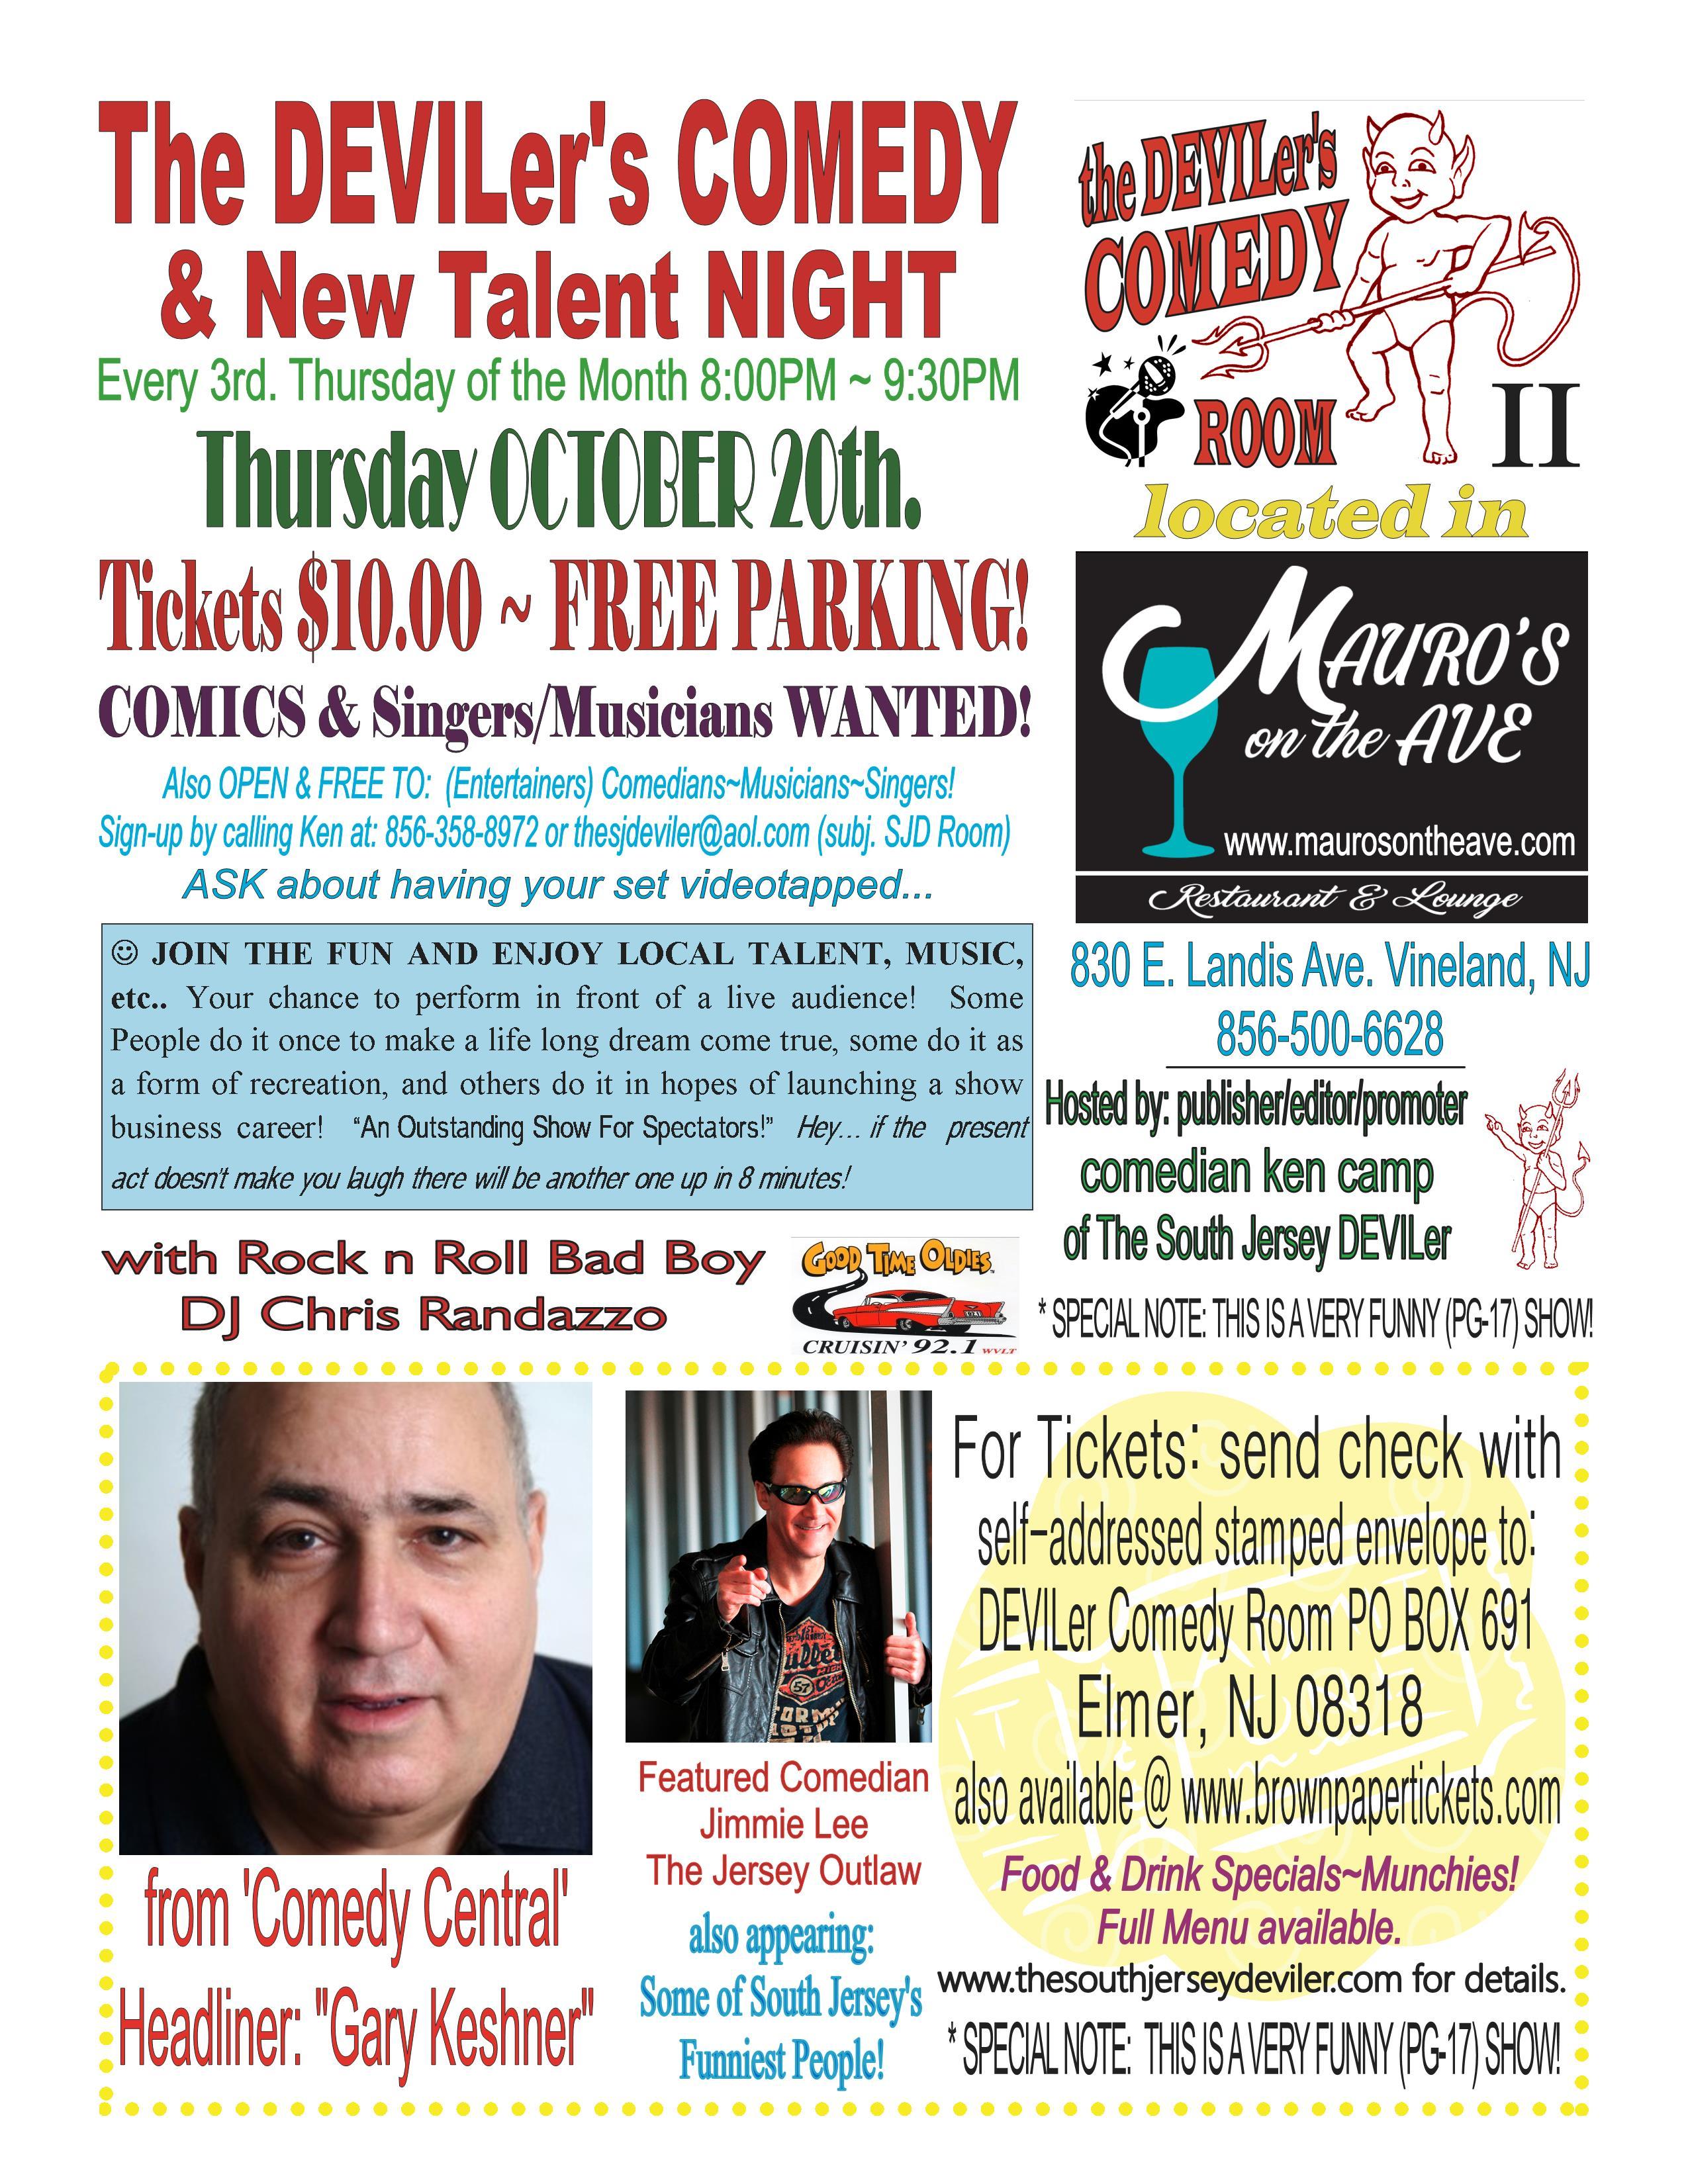 Comedy Night FUNraiser for Semper Fidlelis 204 Marine Corp League